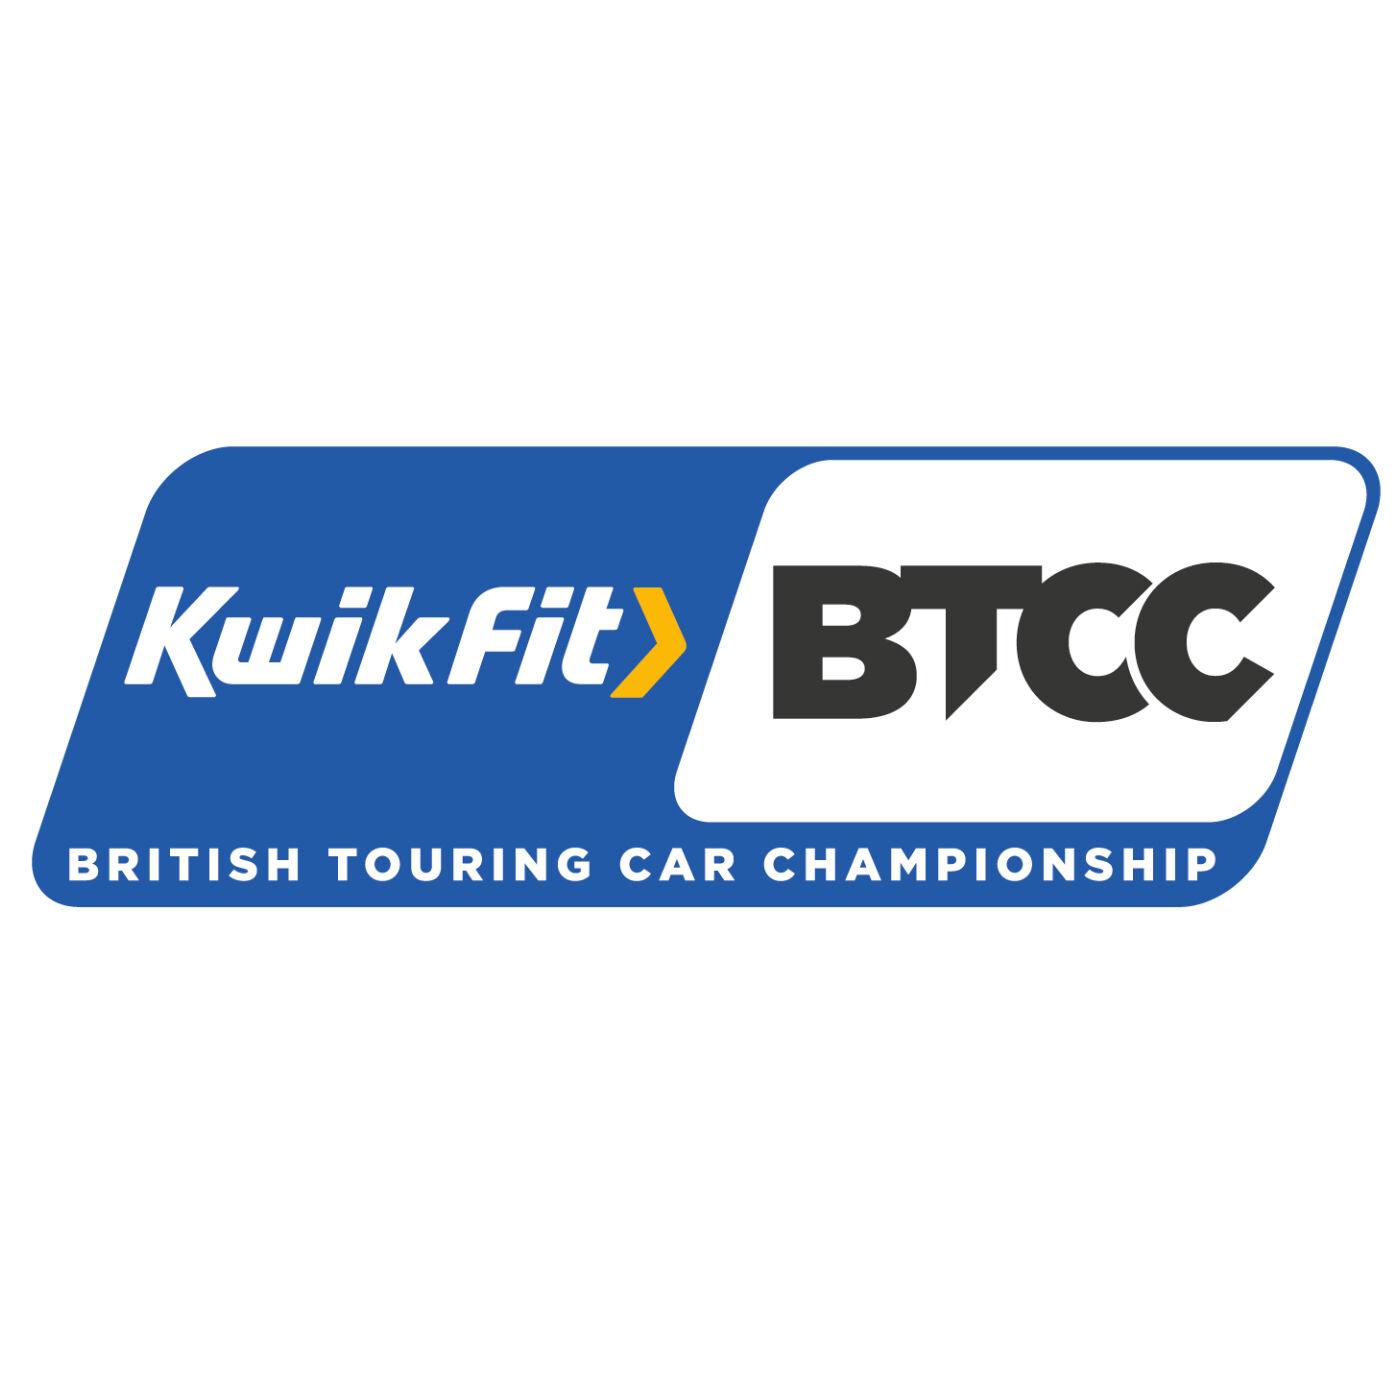 Colin Turkington - Team BMW - Brands Hatch Race 2 - 15th November 2020